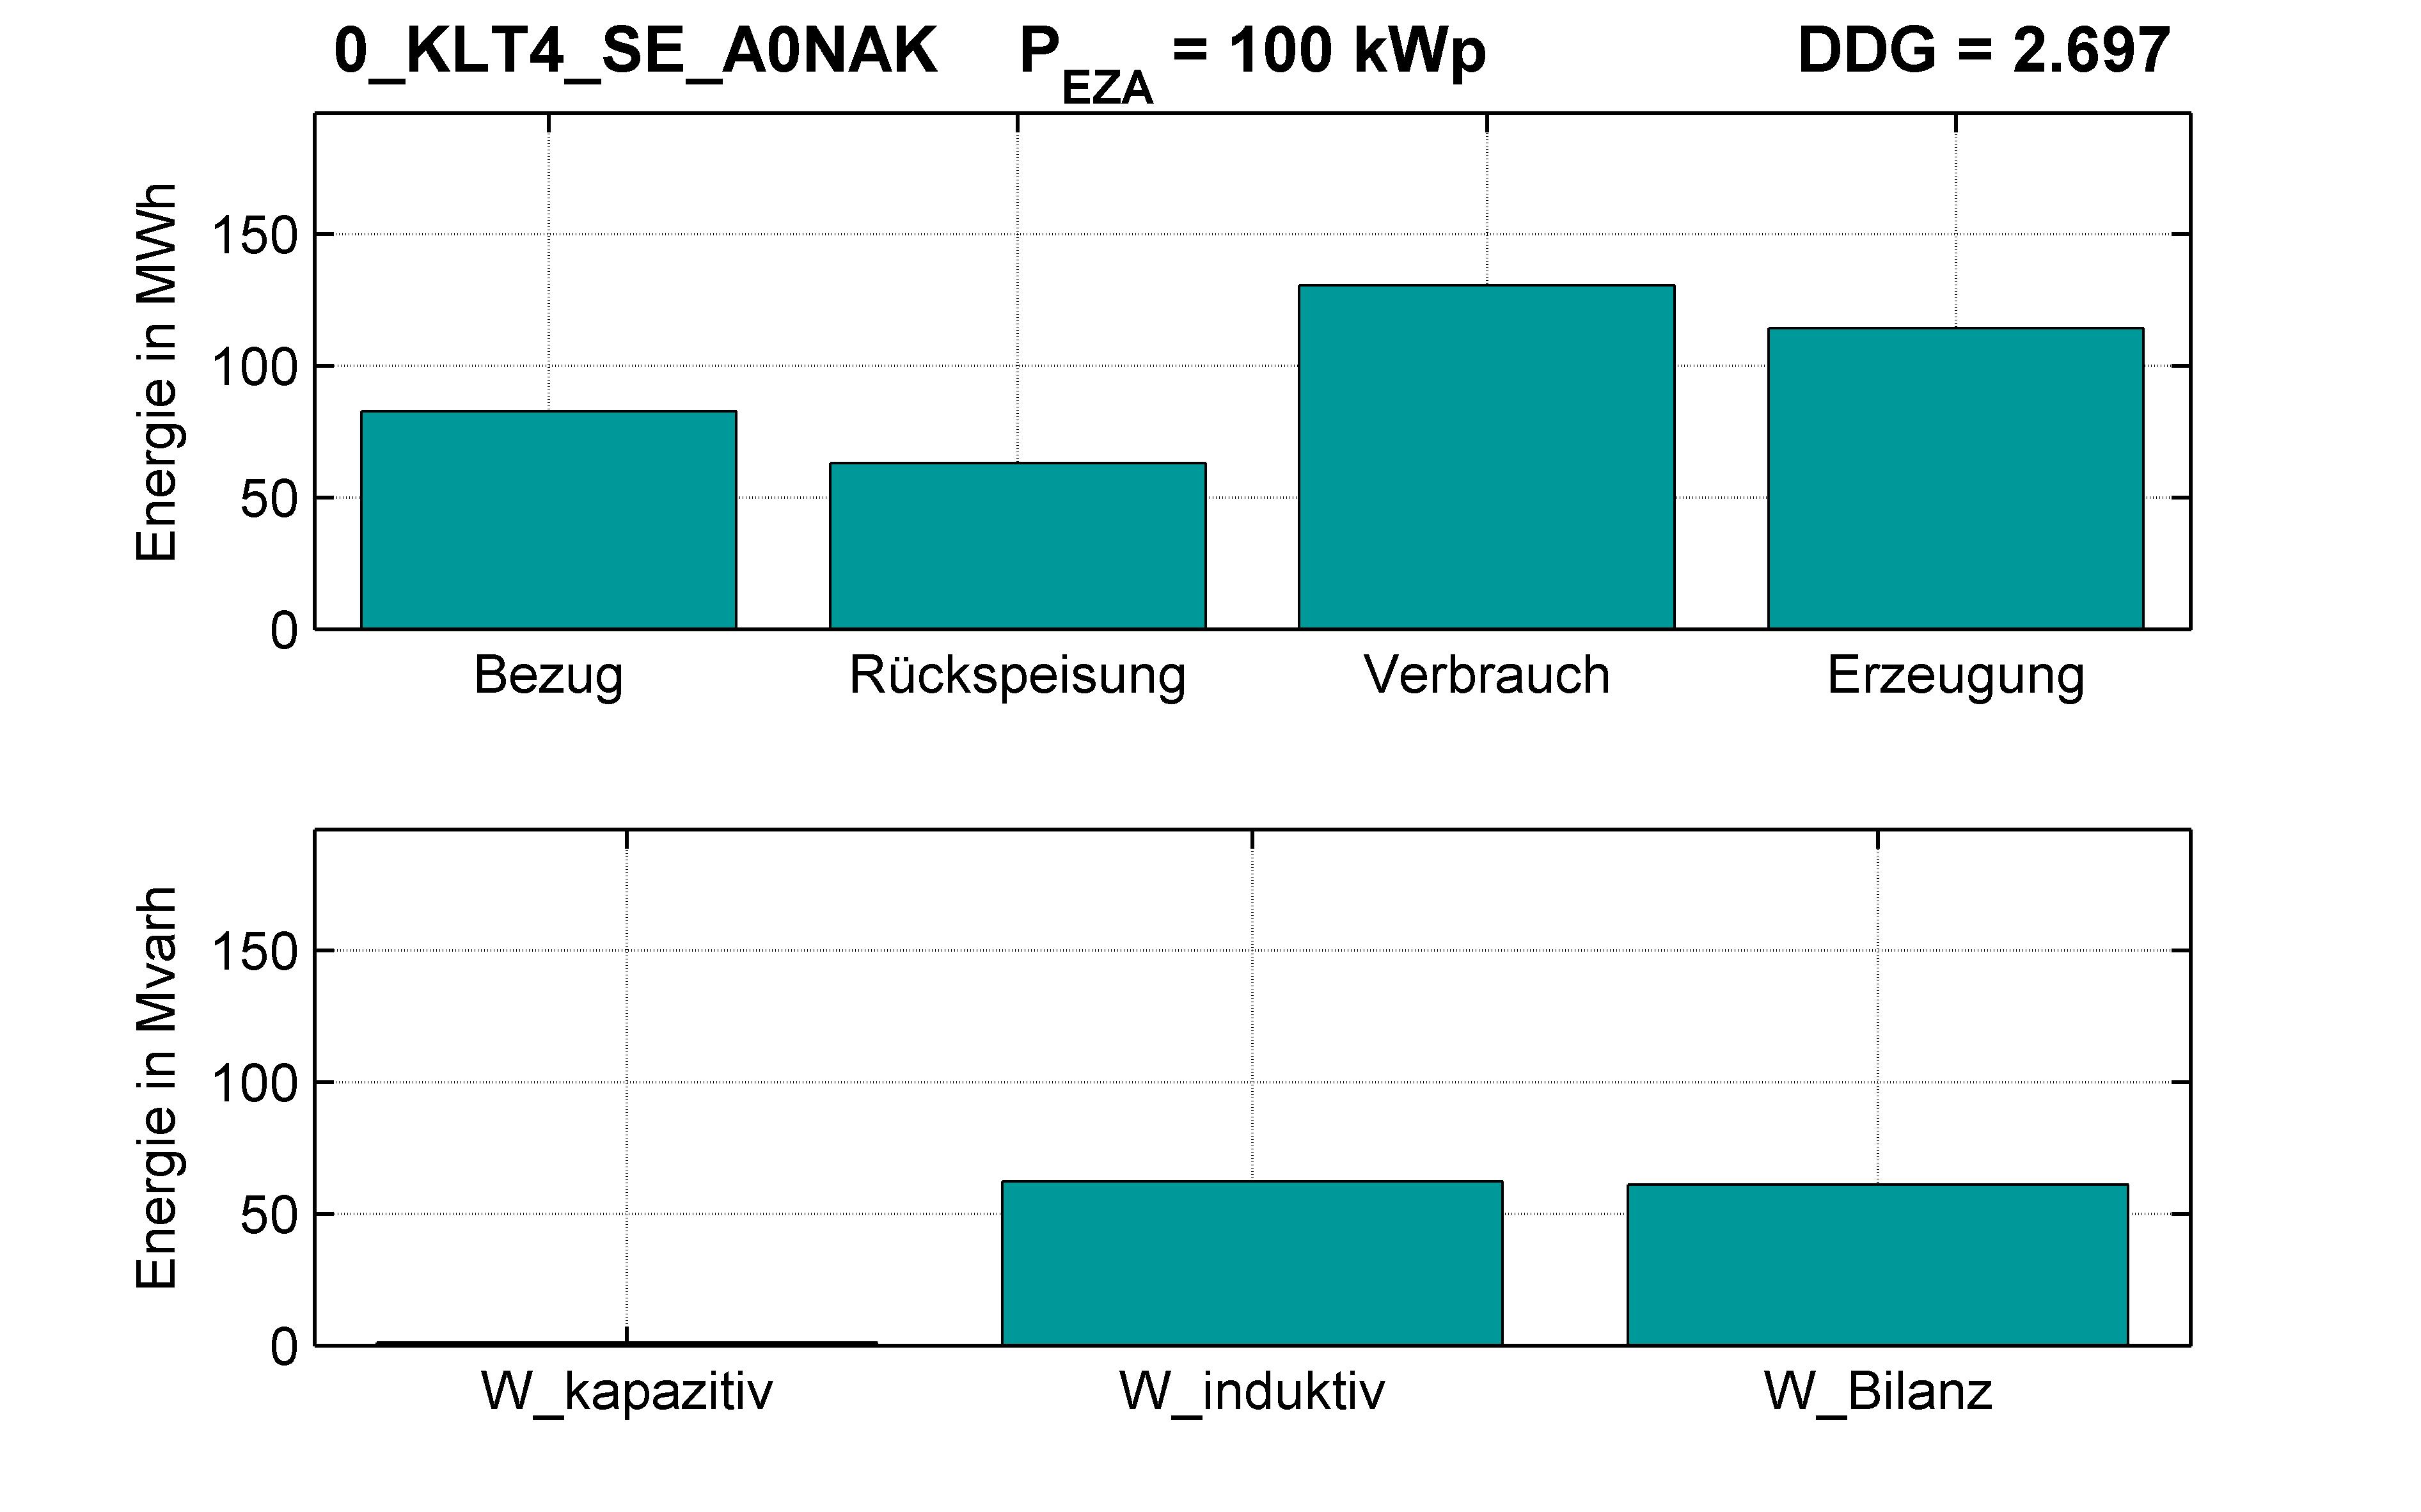 KLT4 | RONT (SE) A0NAK | PQ-Bilanz